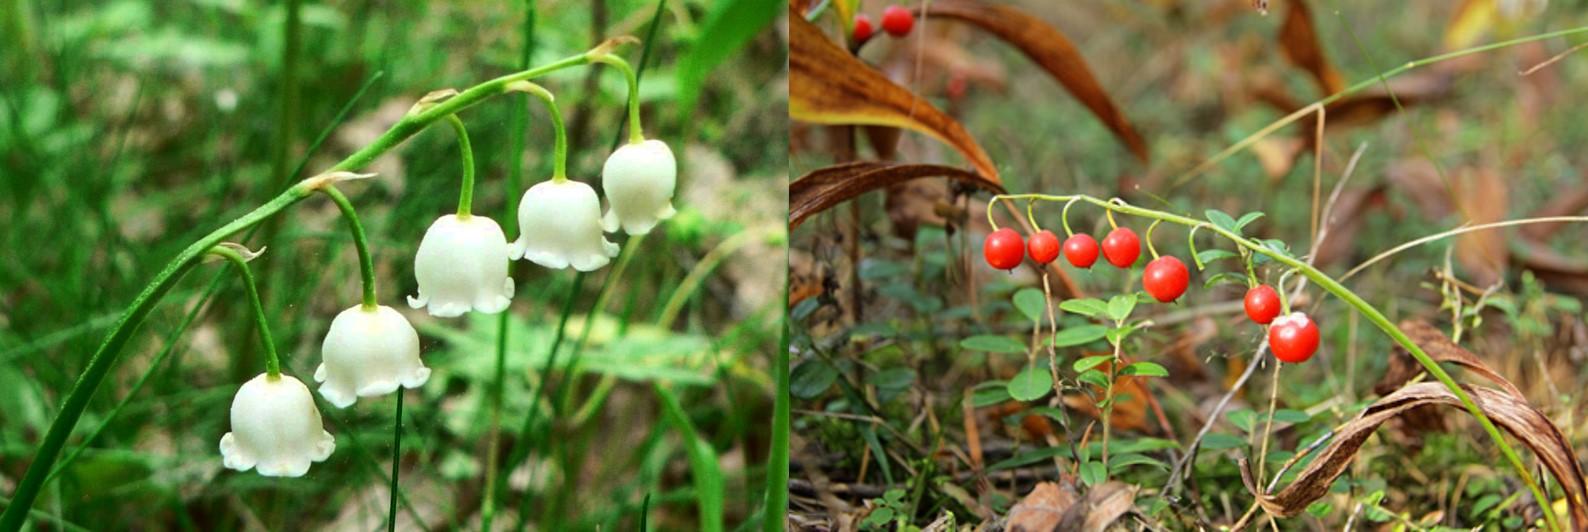 3 common veggies that can be eaten raw - 3 common veggies that can be eaten raw - lily-of-the-valley